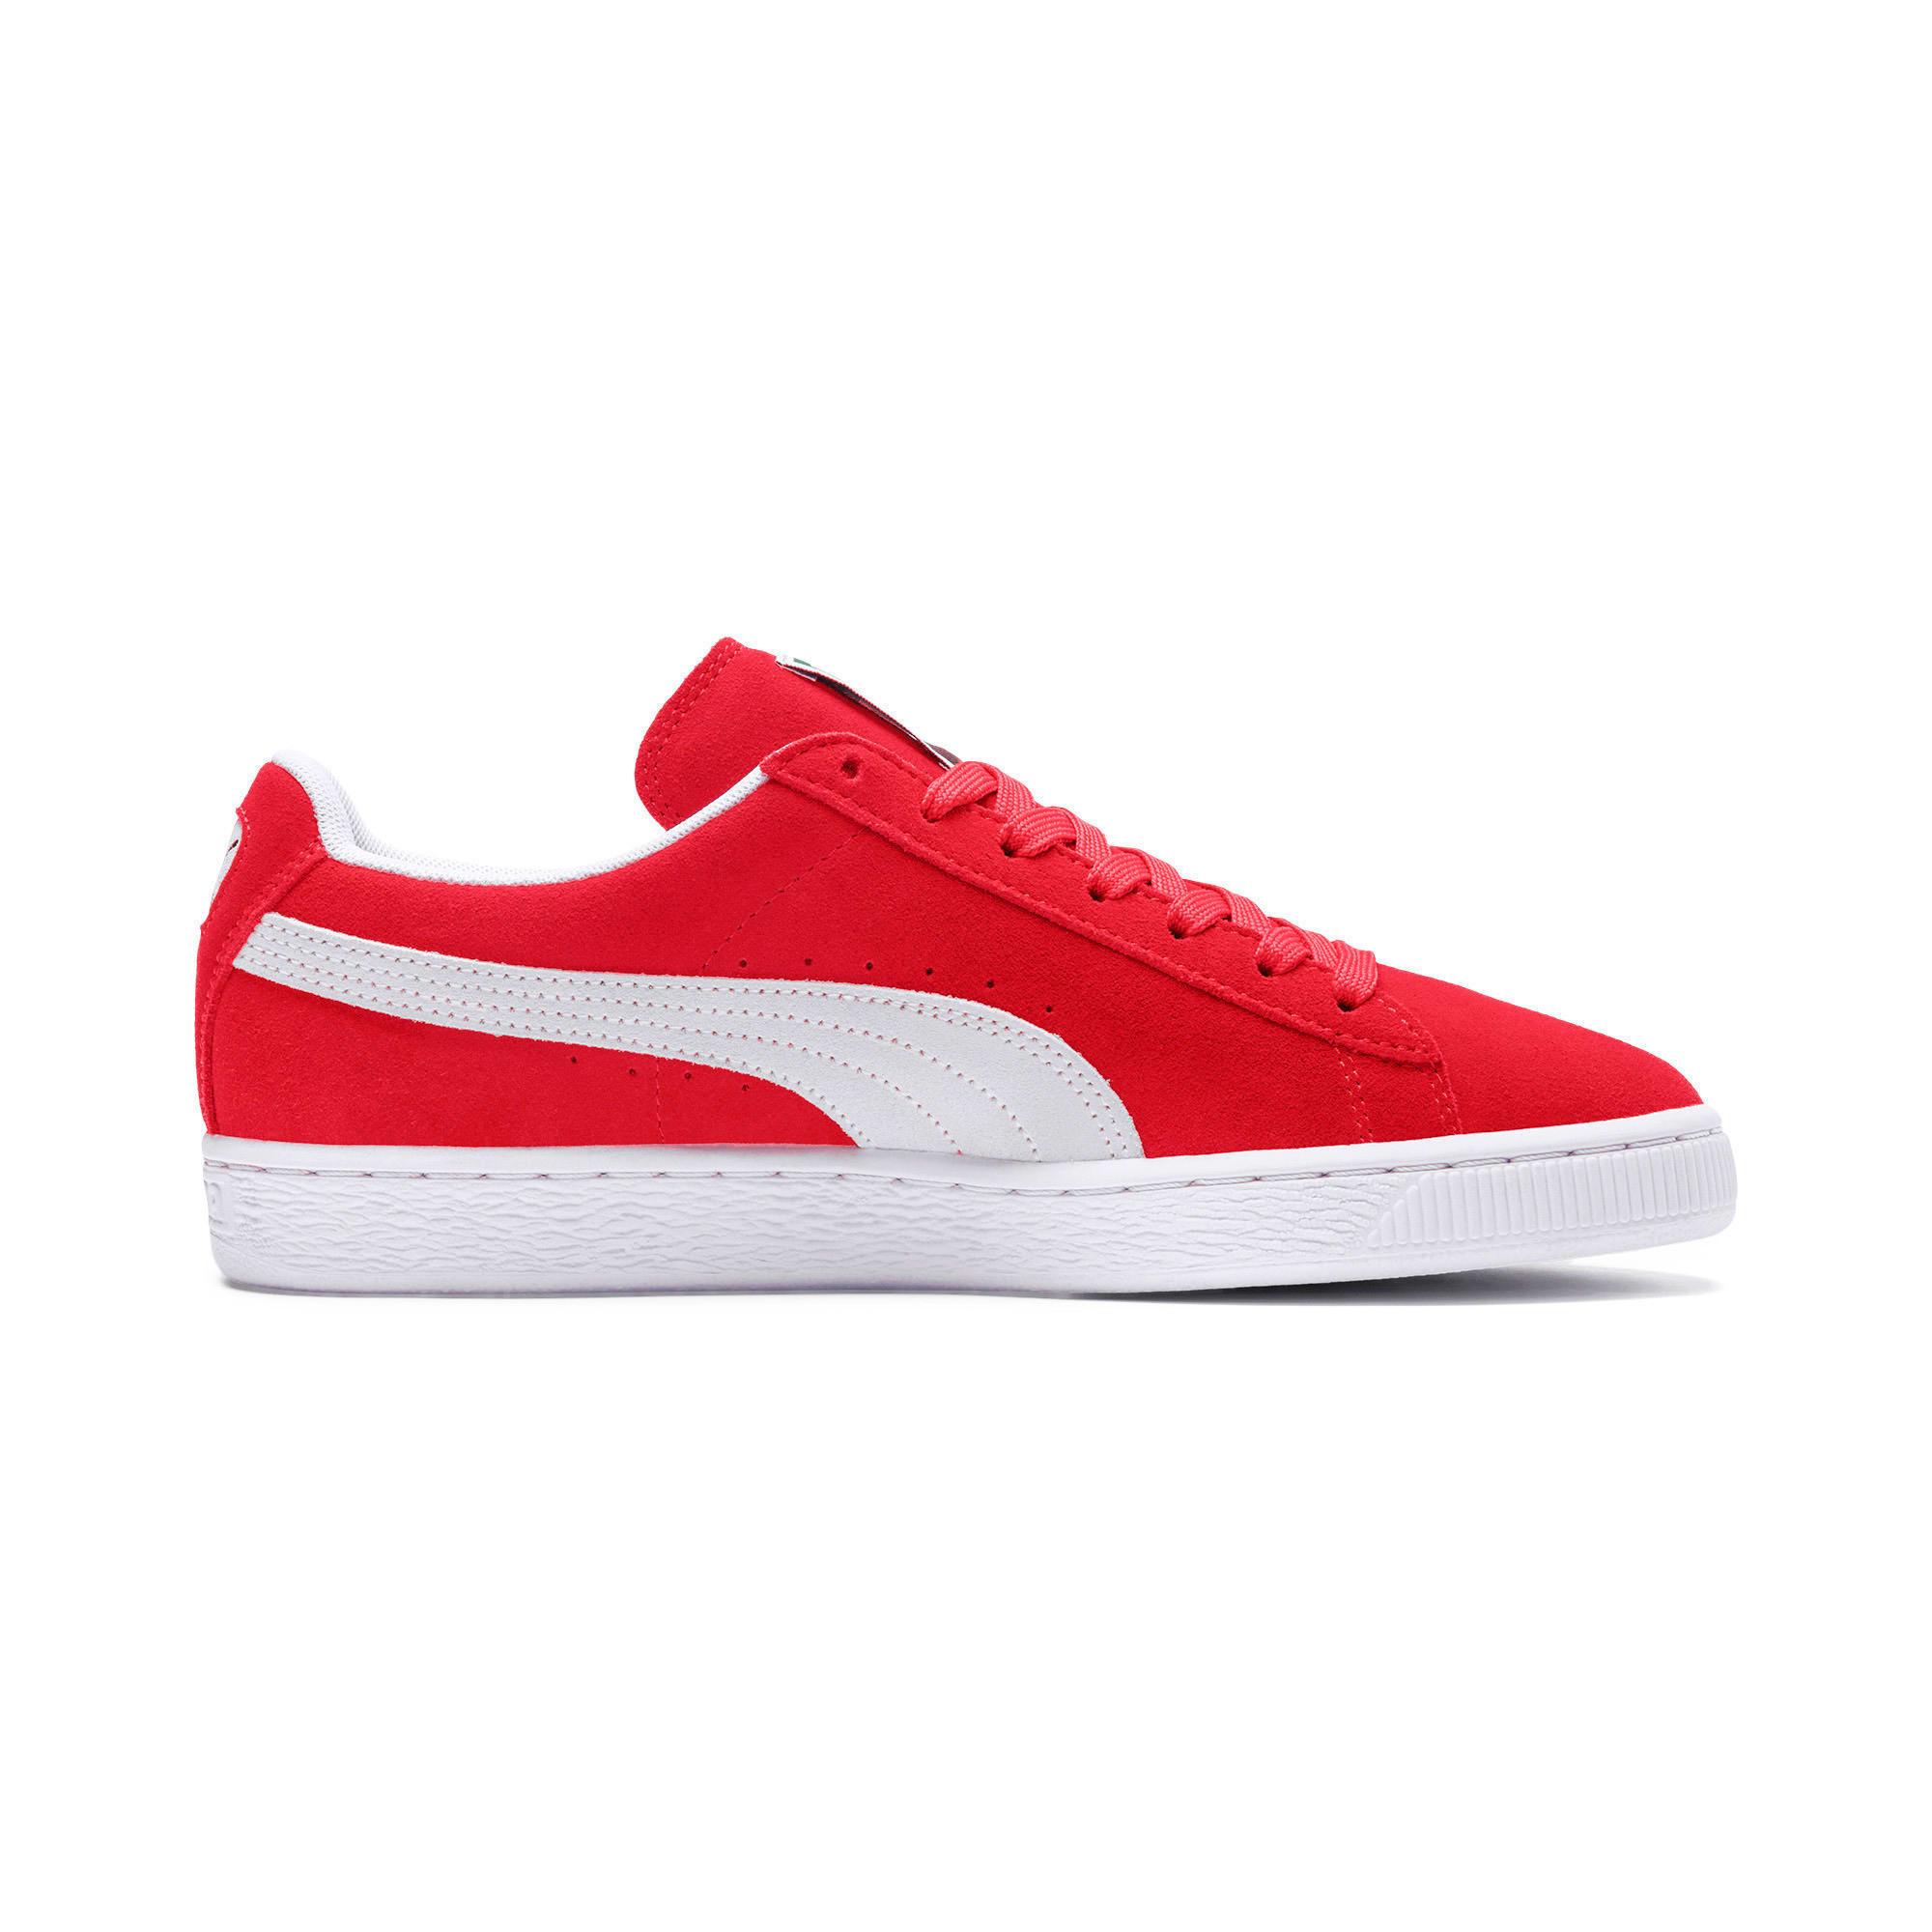 Miniatura 5 de Zapatos deportivos clásicos de gamuza, team regal red-white, mediano